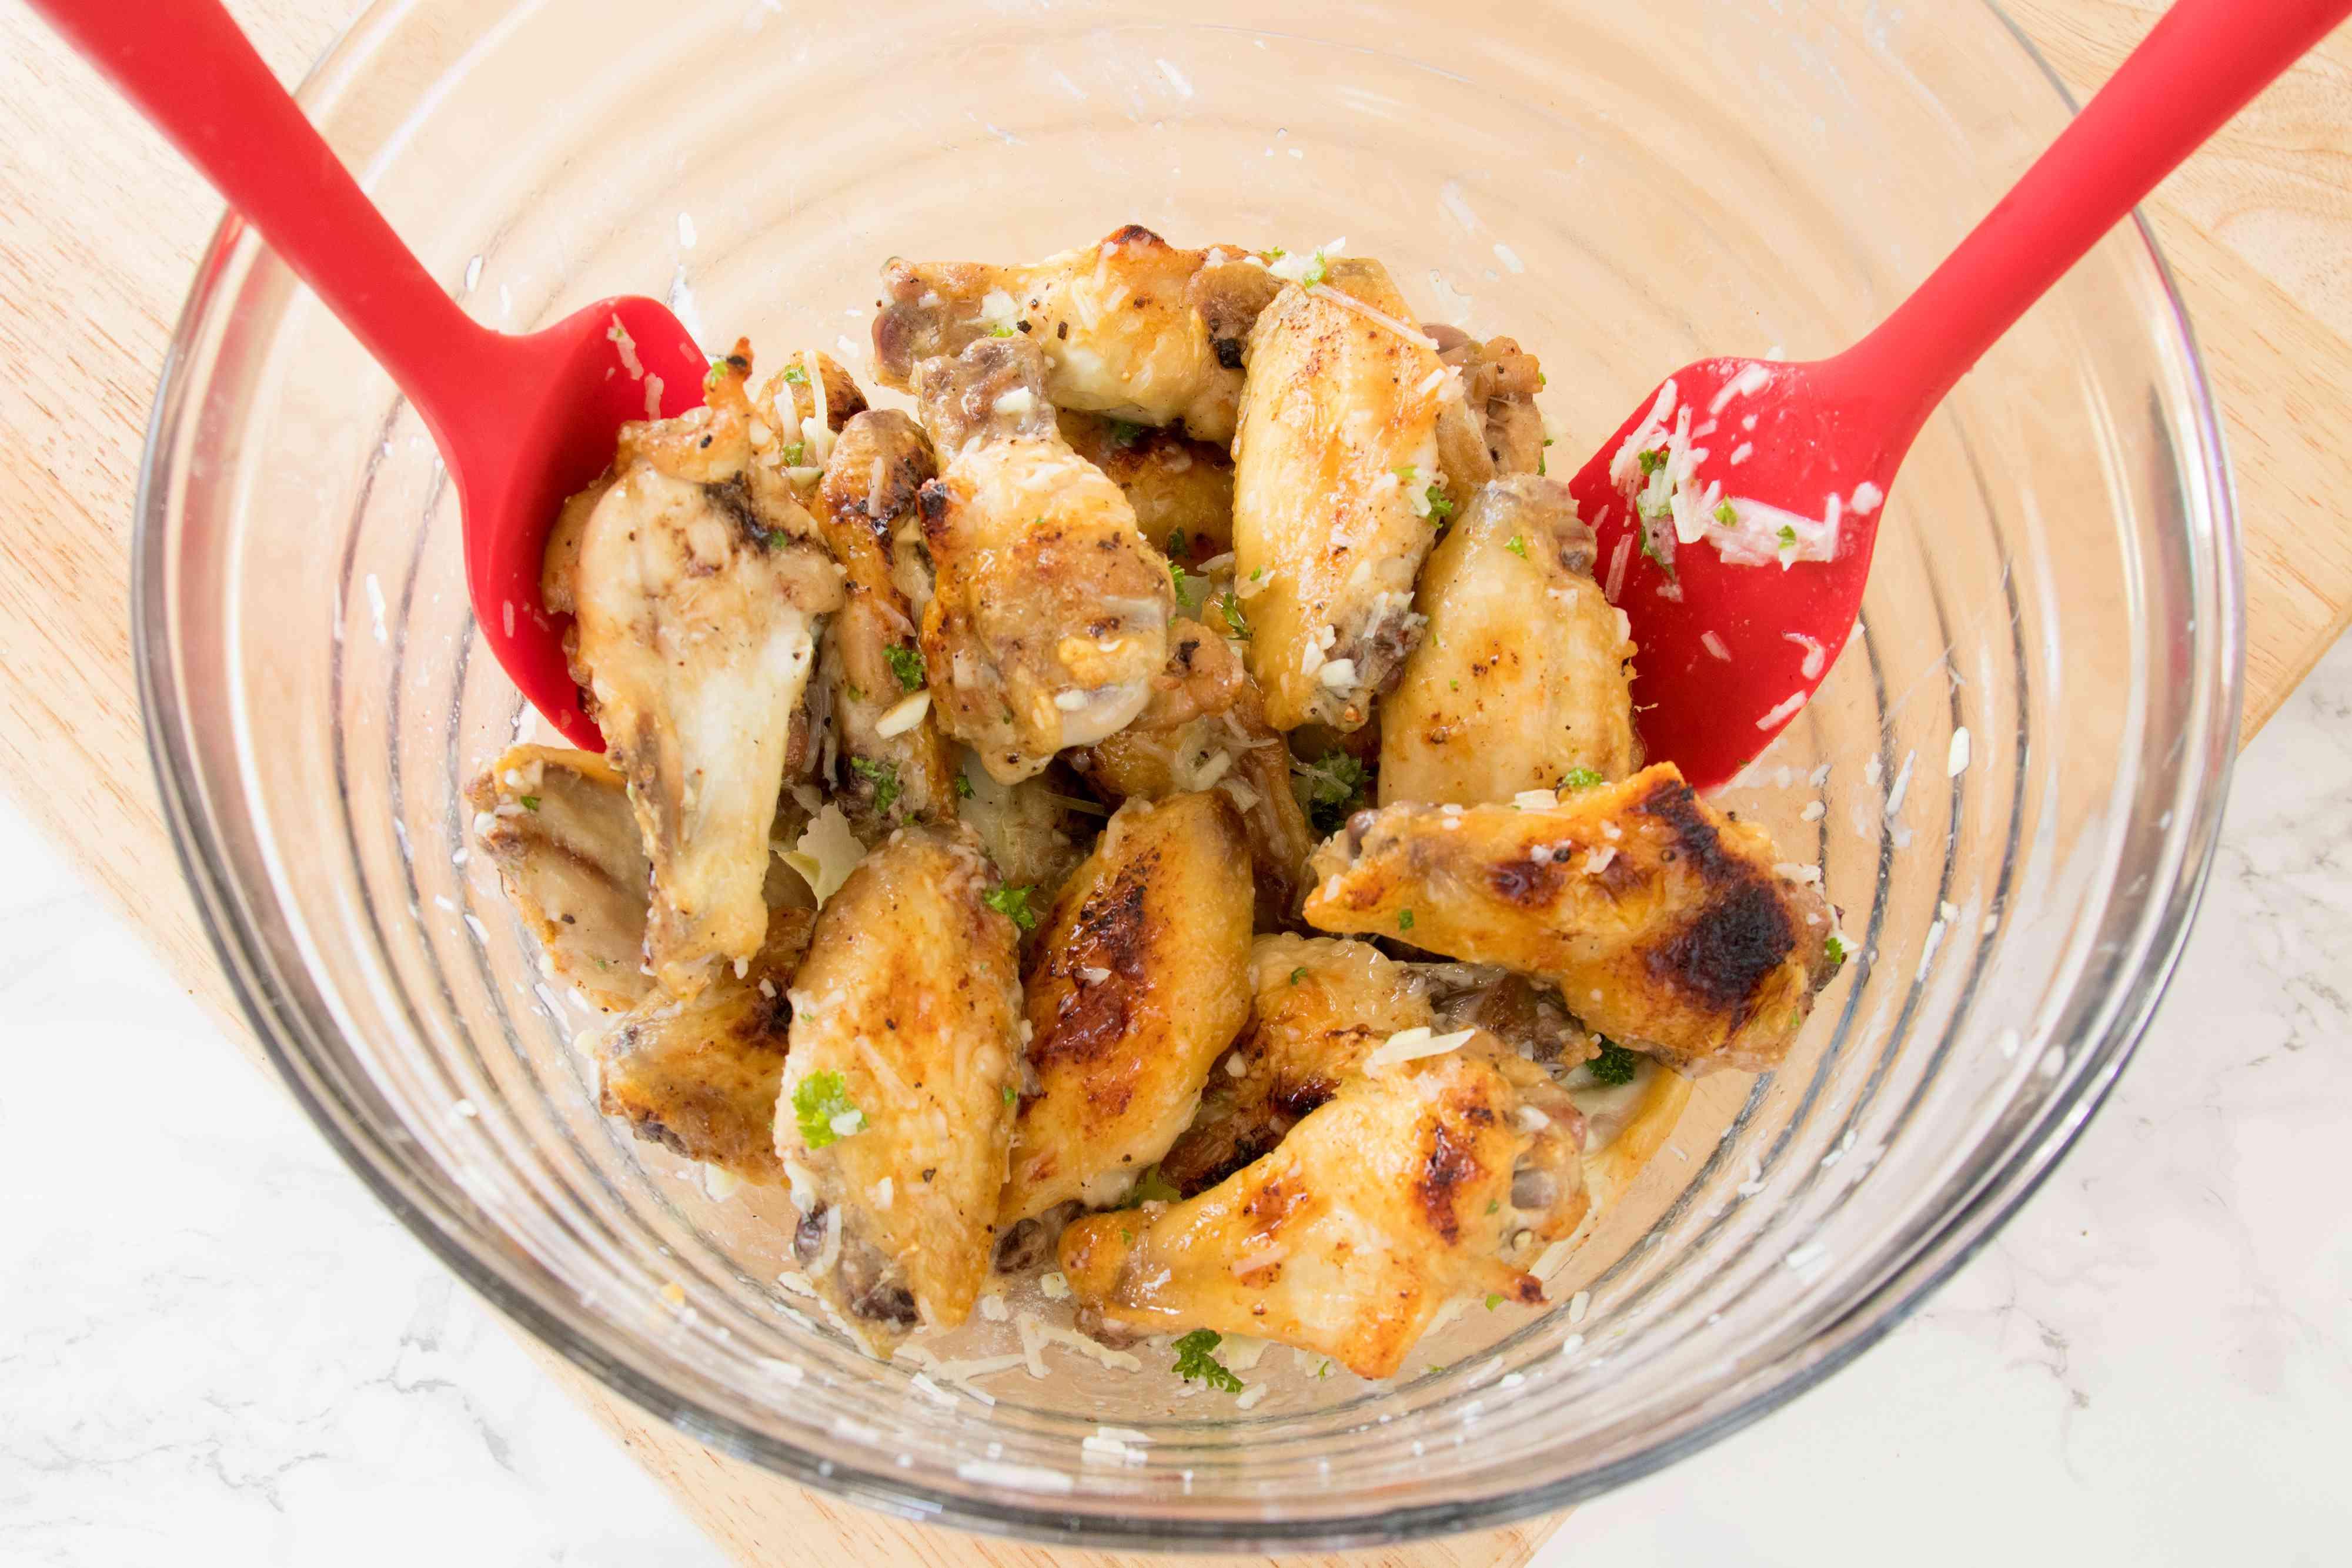 Tossing garlic-Parmesan chicken wings